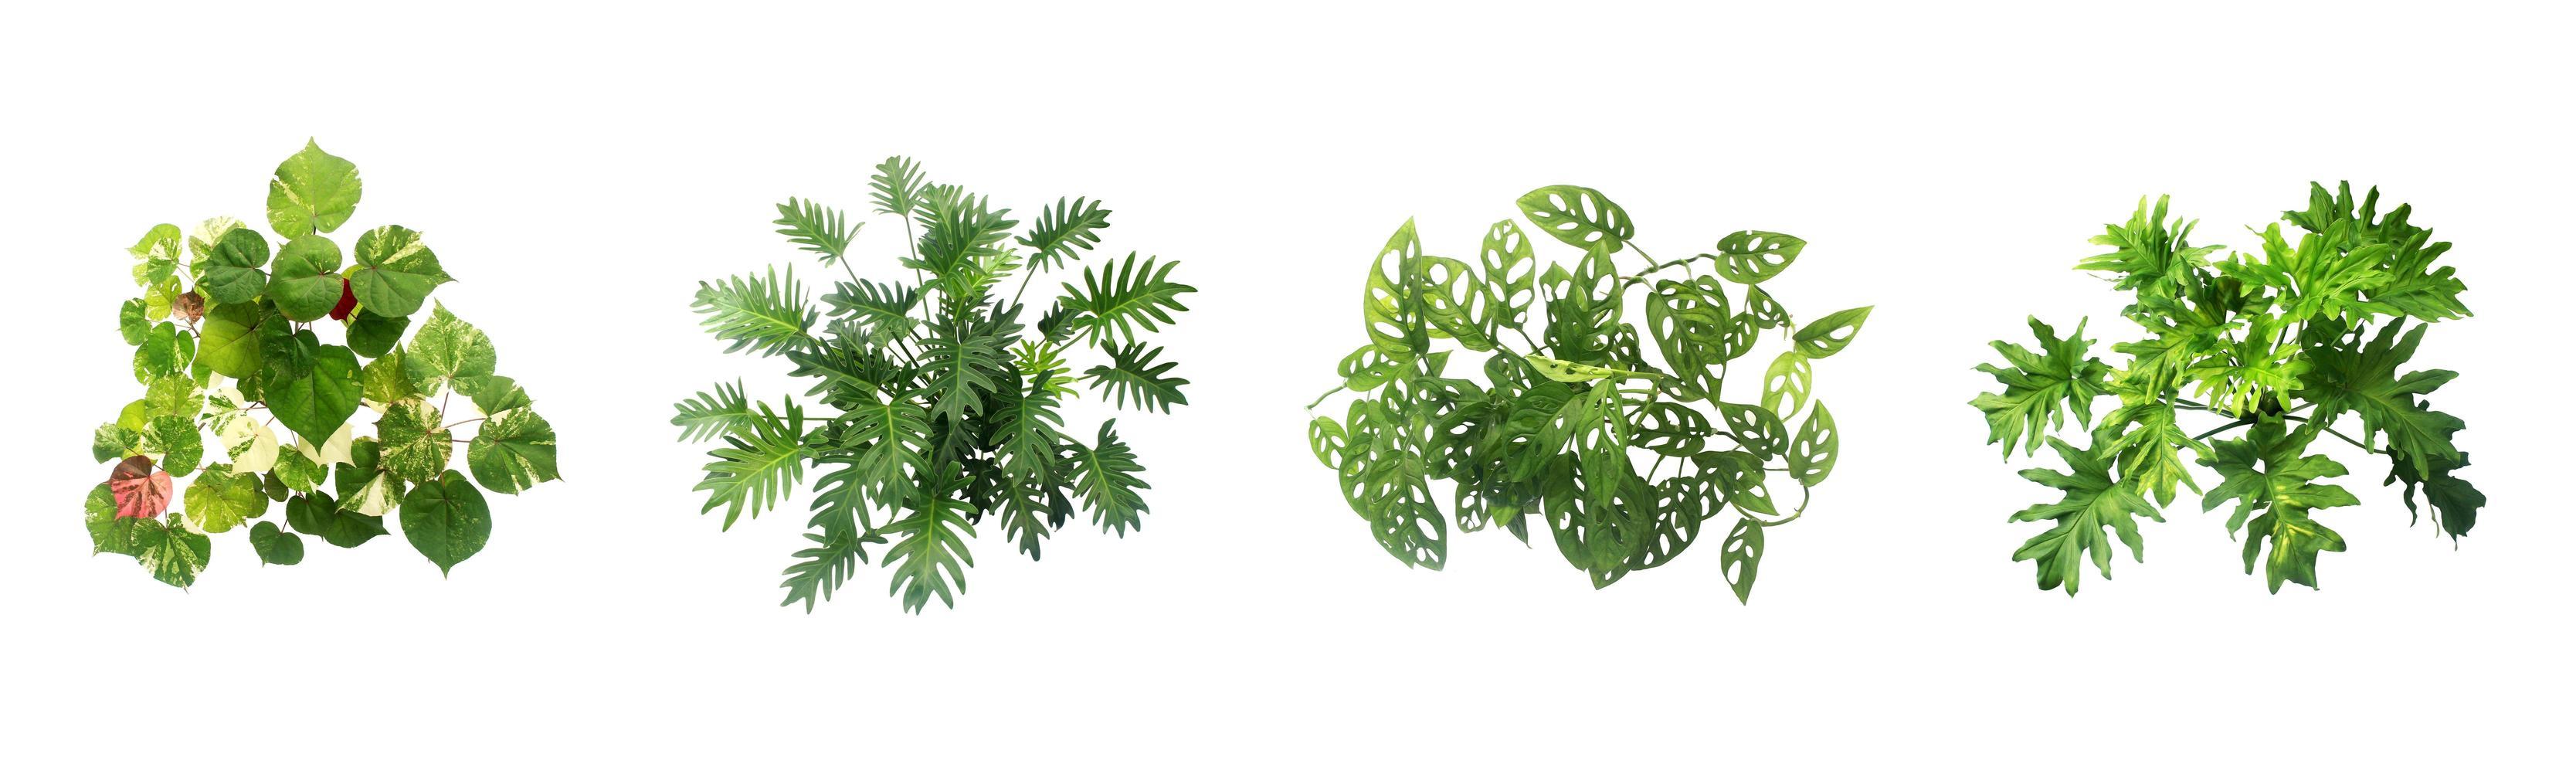 piante verdi su sfondo bianco foto